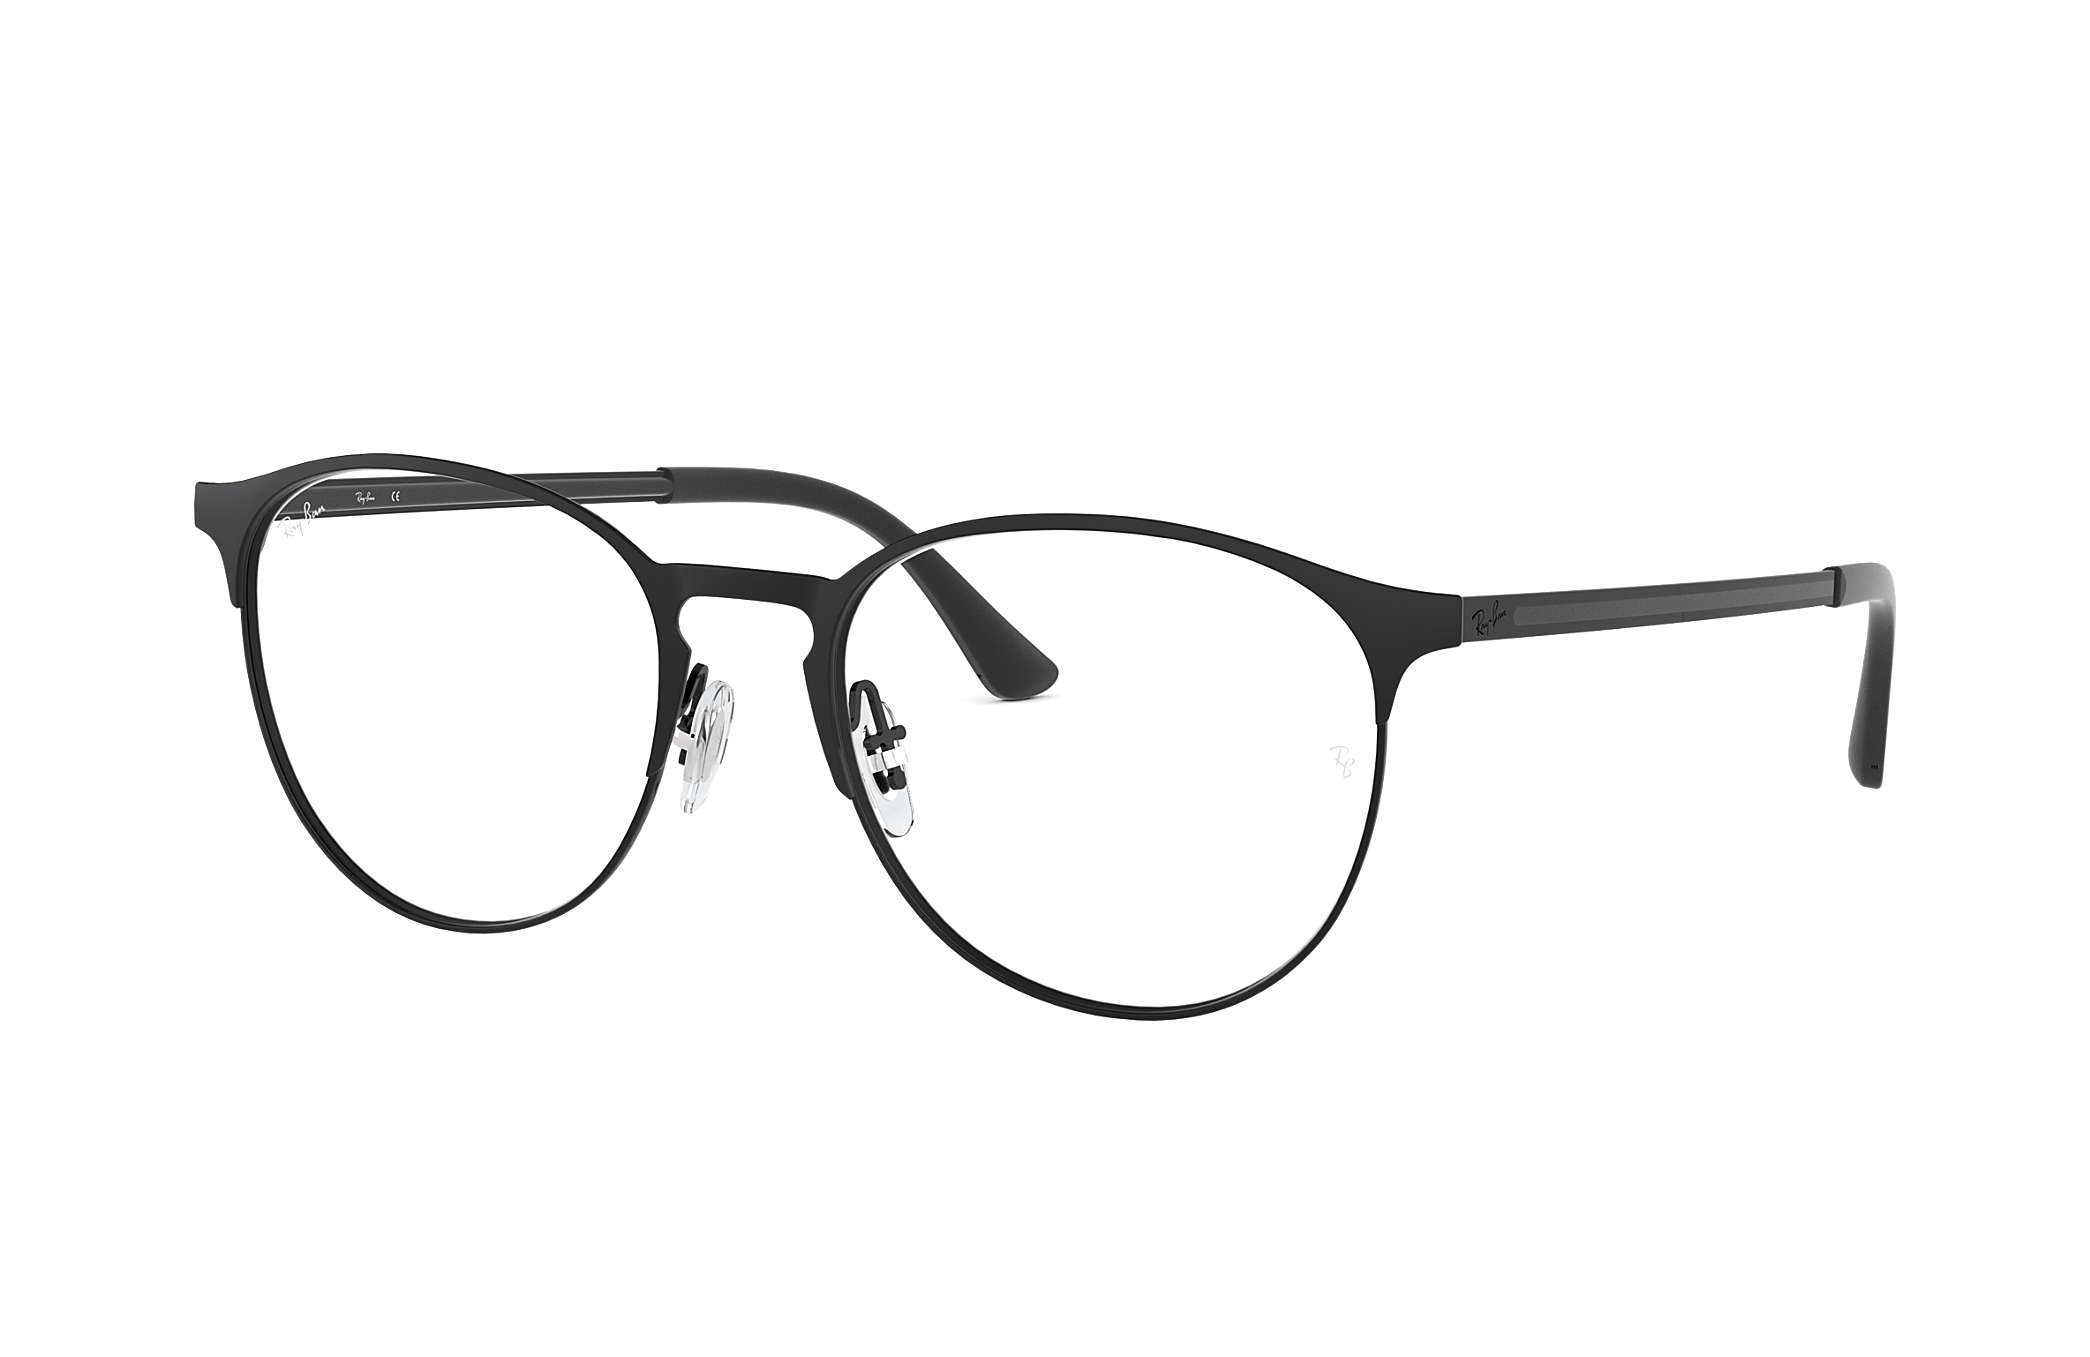 d4a128883 Óculos de grau Ray-Ban RB6375 Preto - Metal - 0RX6375294453 | Ray ...